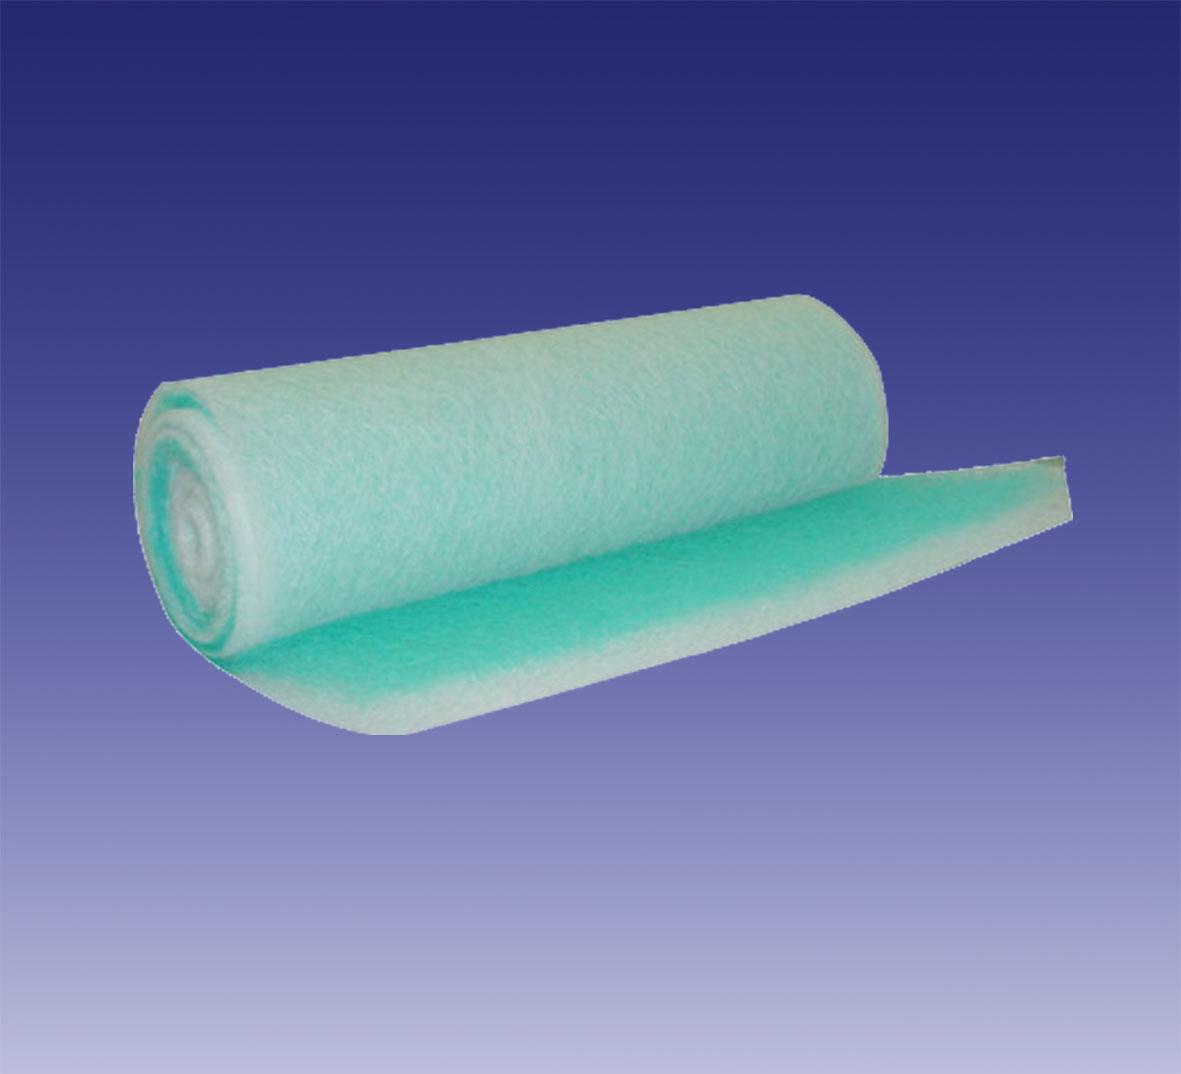 G2玻璃纤维阻漆过滤网(240g)